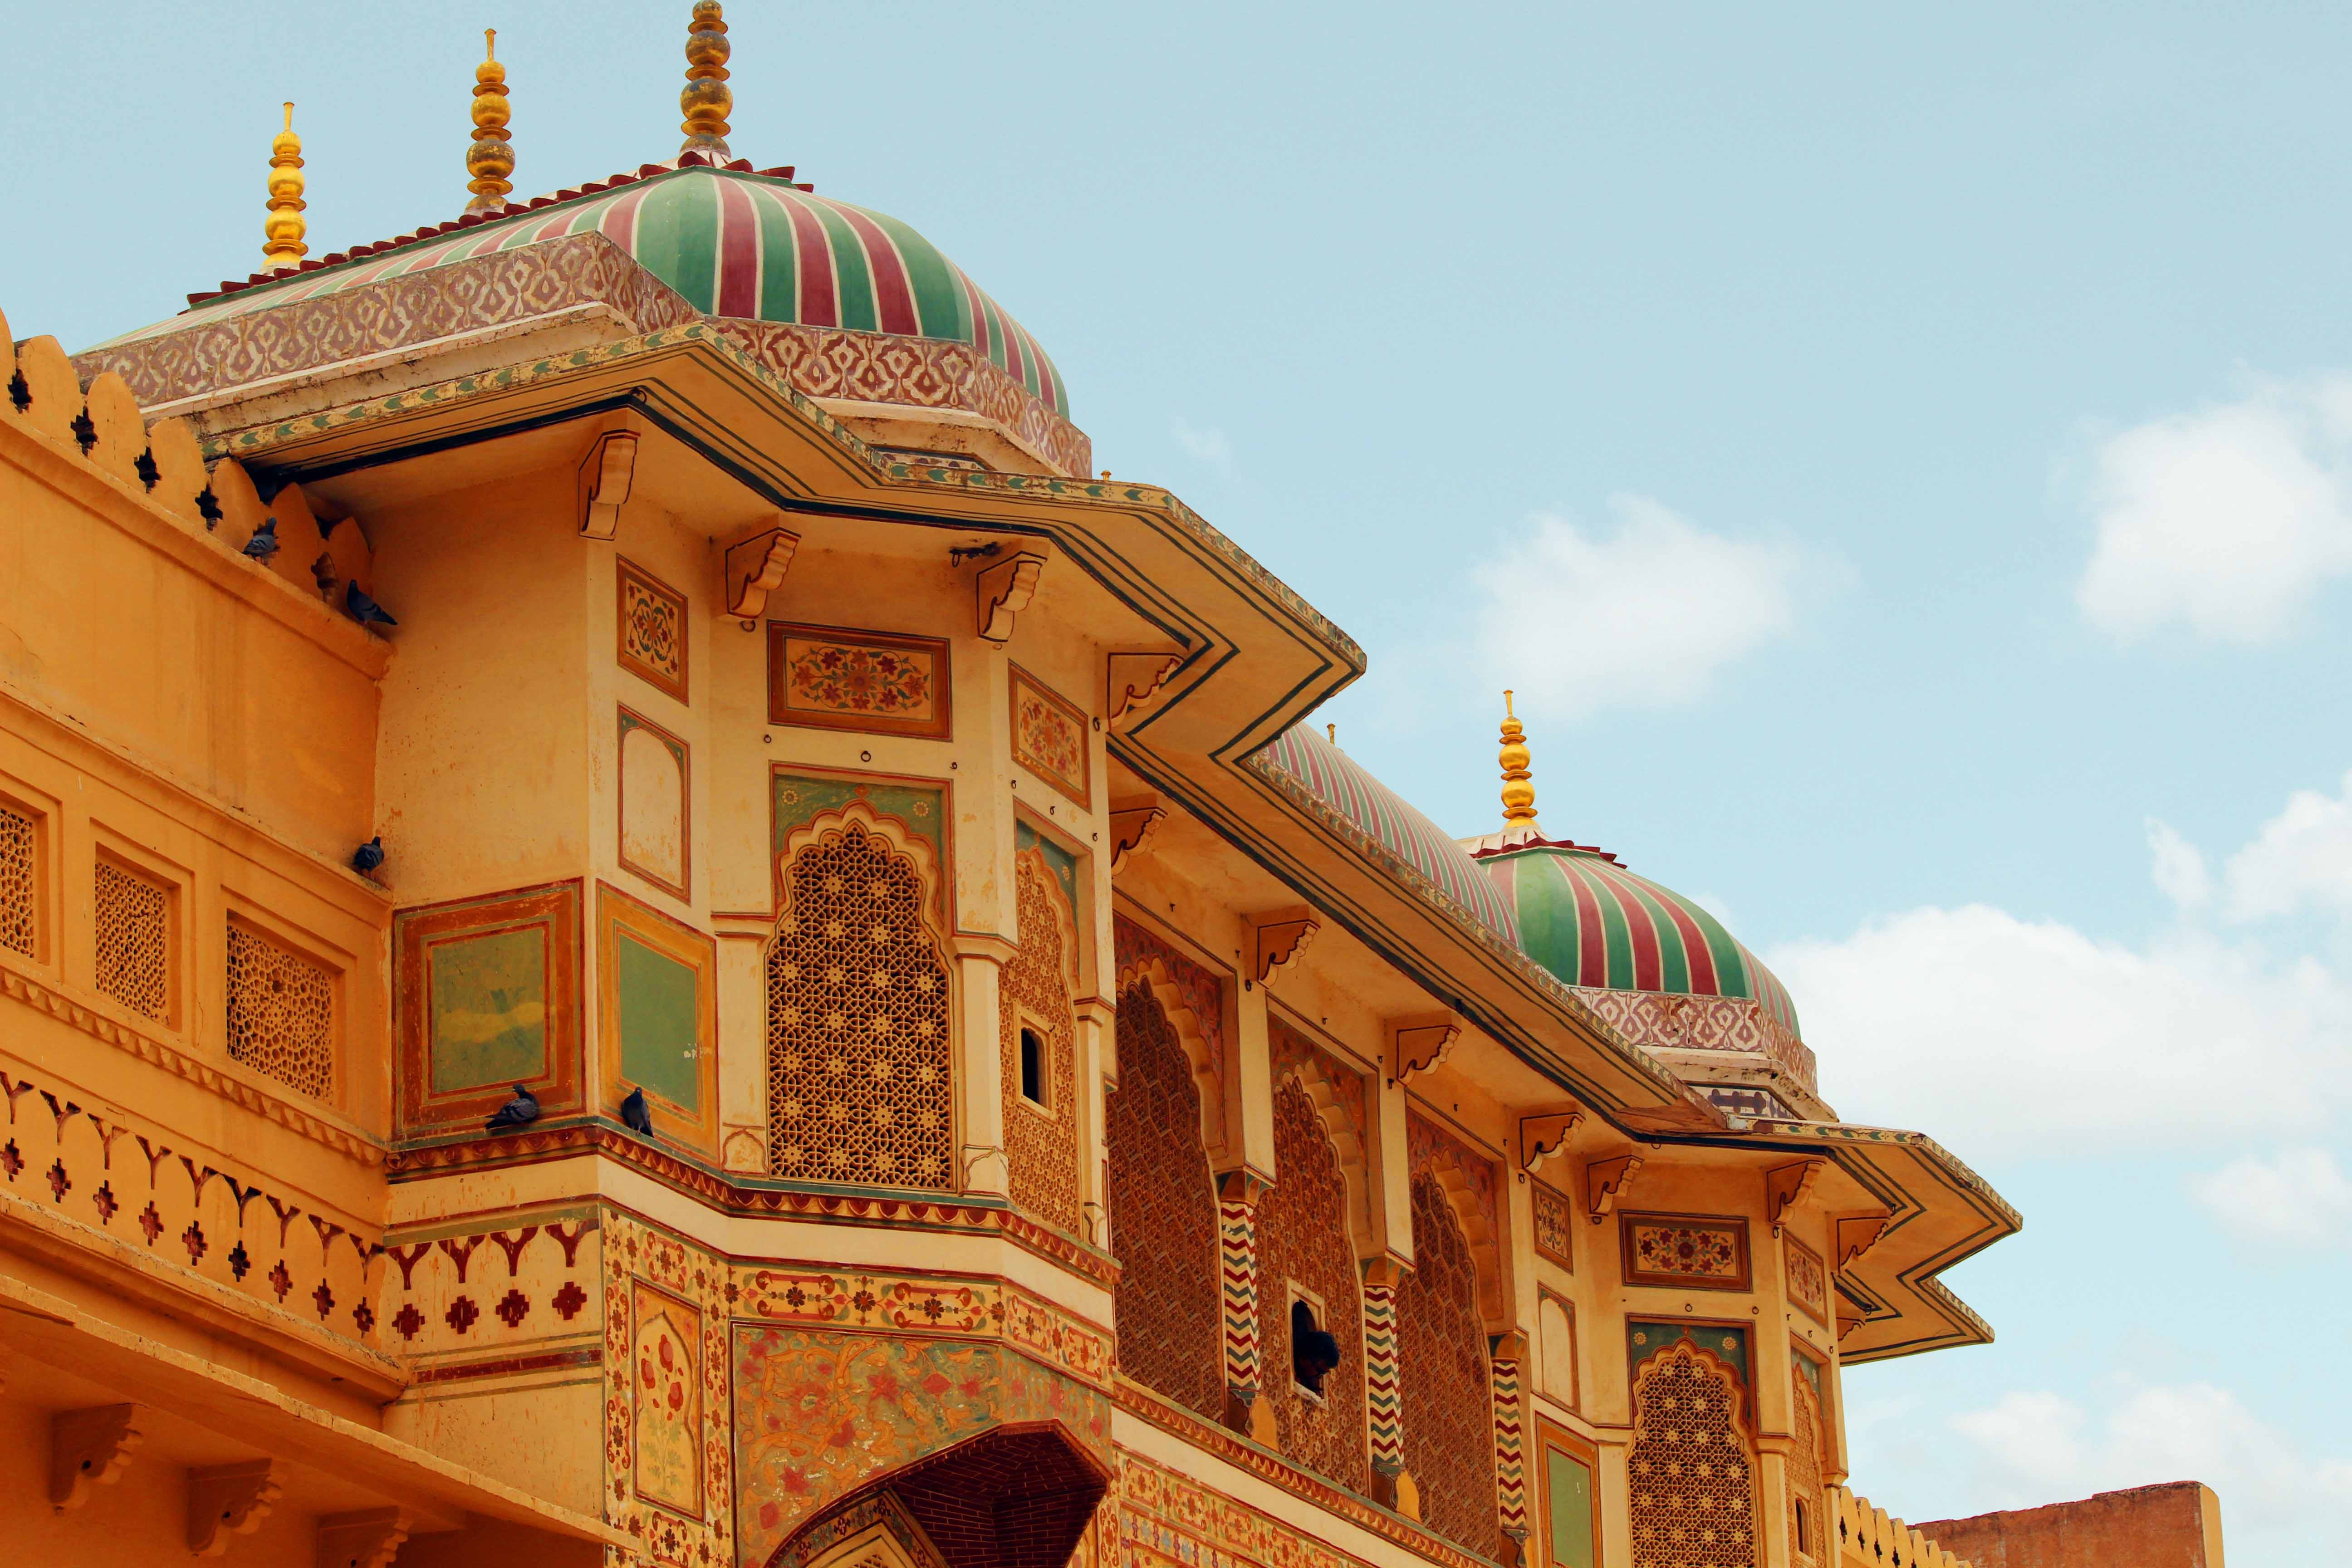 Brown and Multicolored Concrete Building